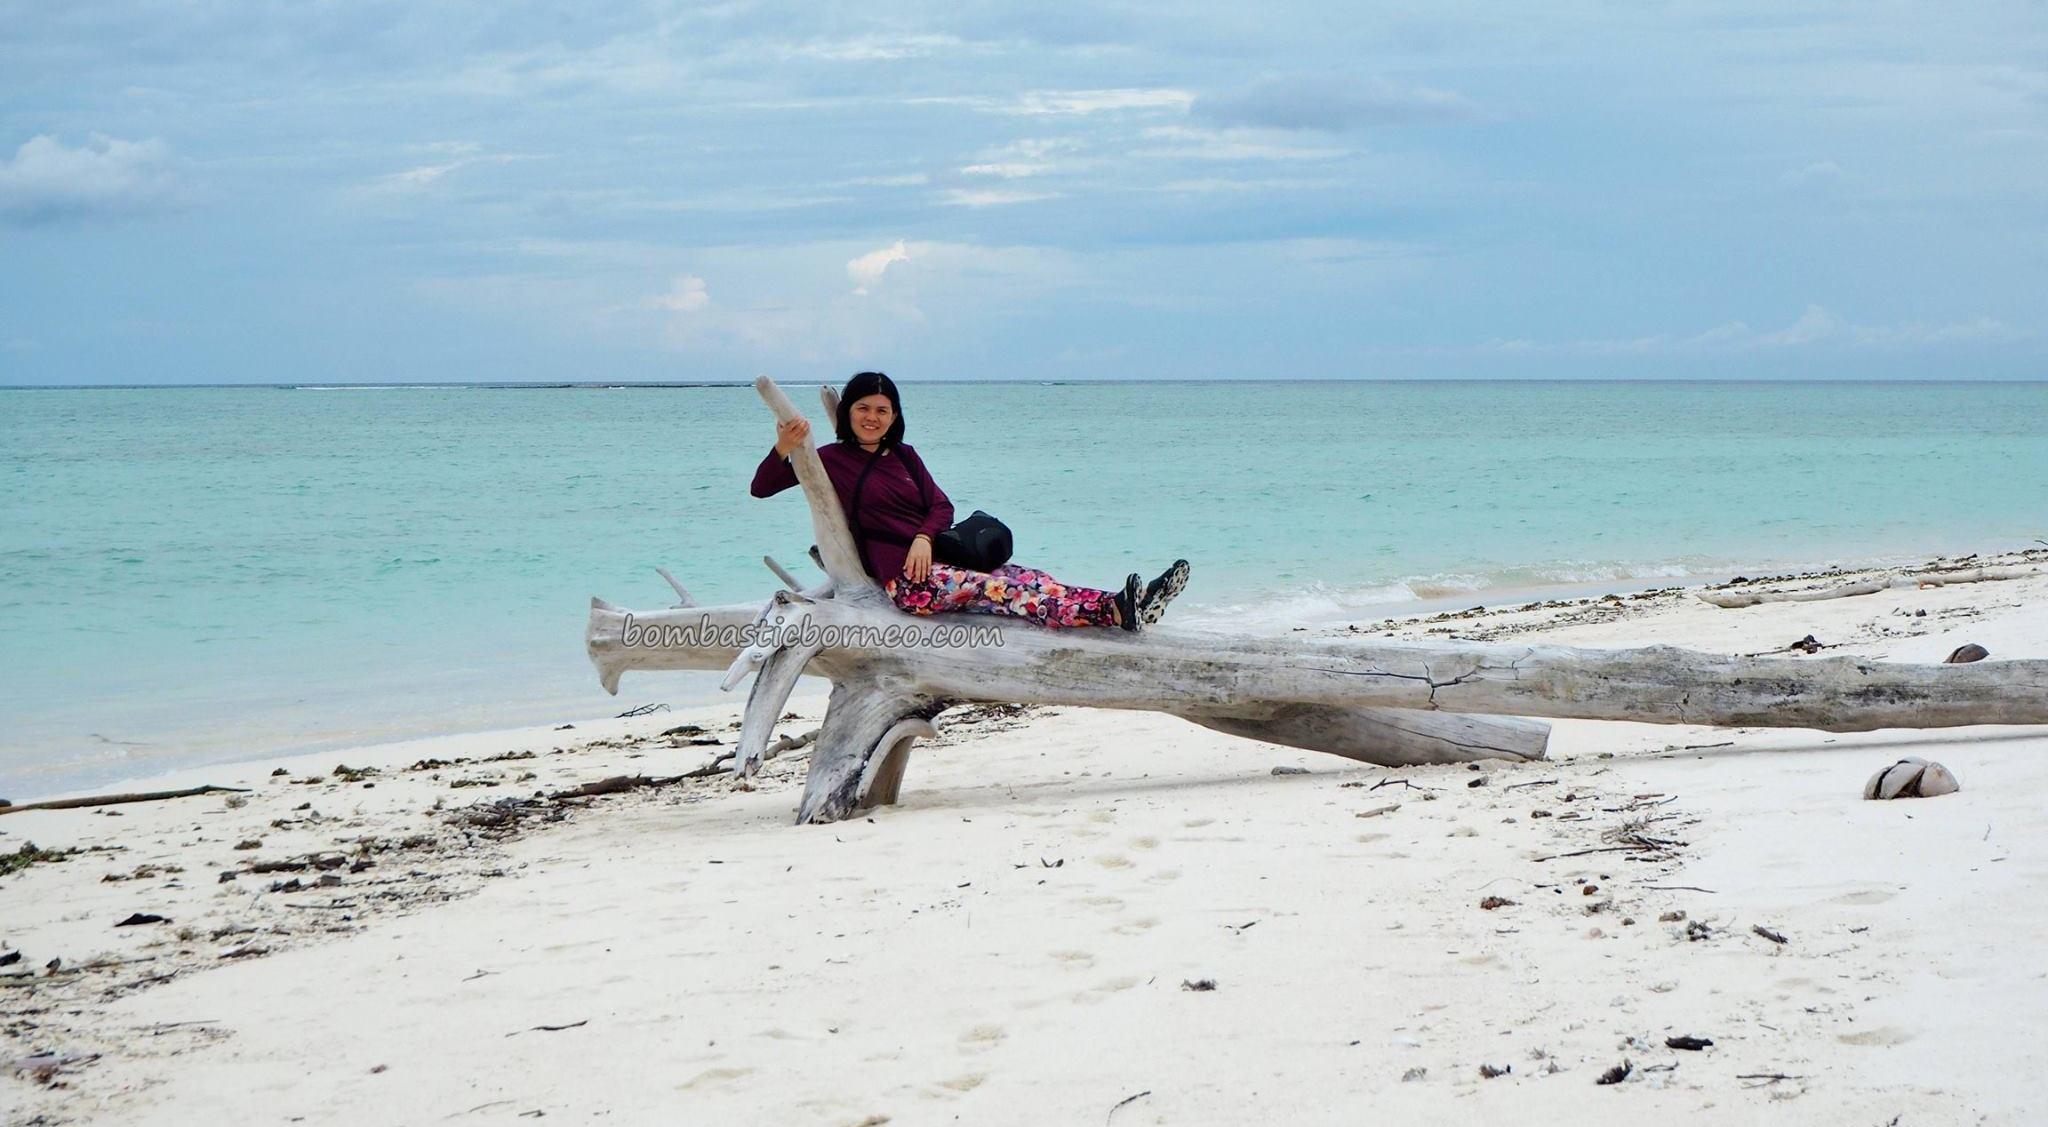 Pulau, adventure, nature, backpackers, destination, Berau, Biduk-Biduk, Indonesia, Tanah Surga, white sandy beach, Tourism, tourist attraction, travel guide, crossborder, 东加里曼丹, 婆罗洲岛,